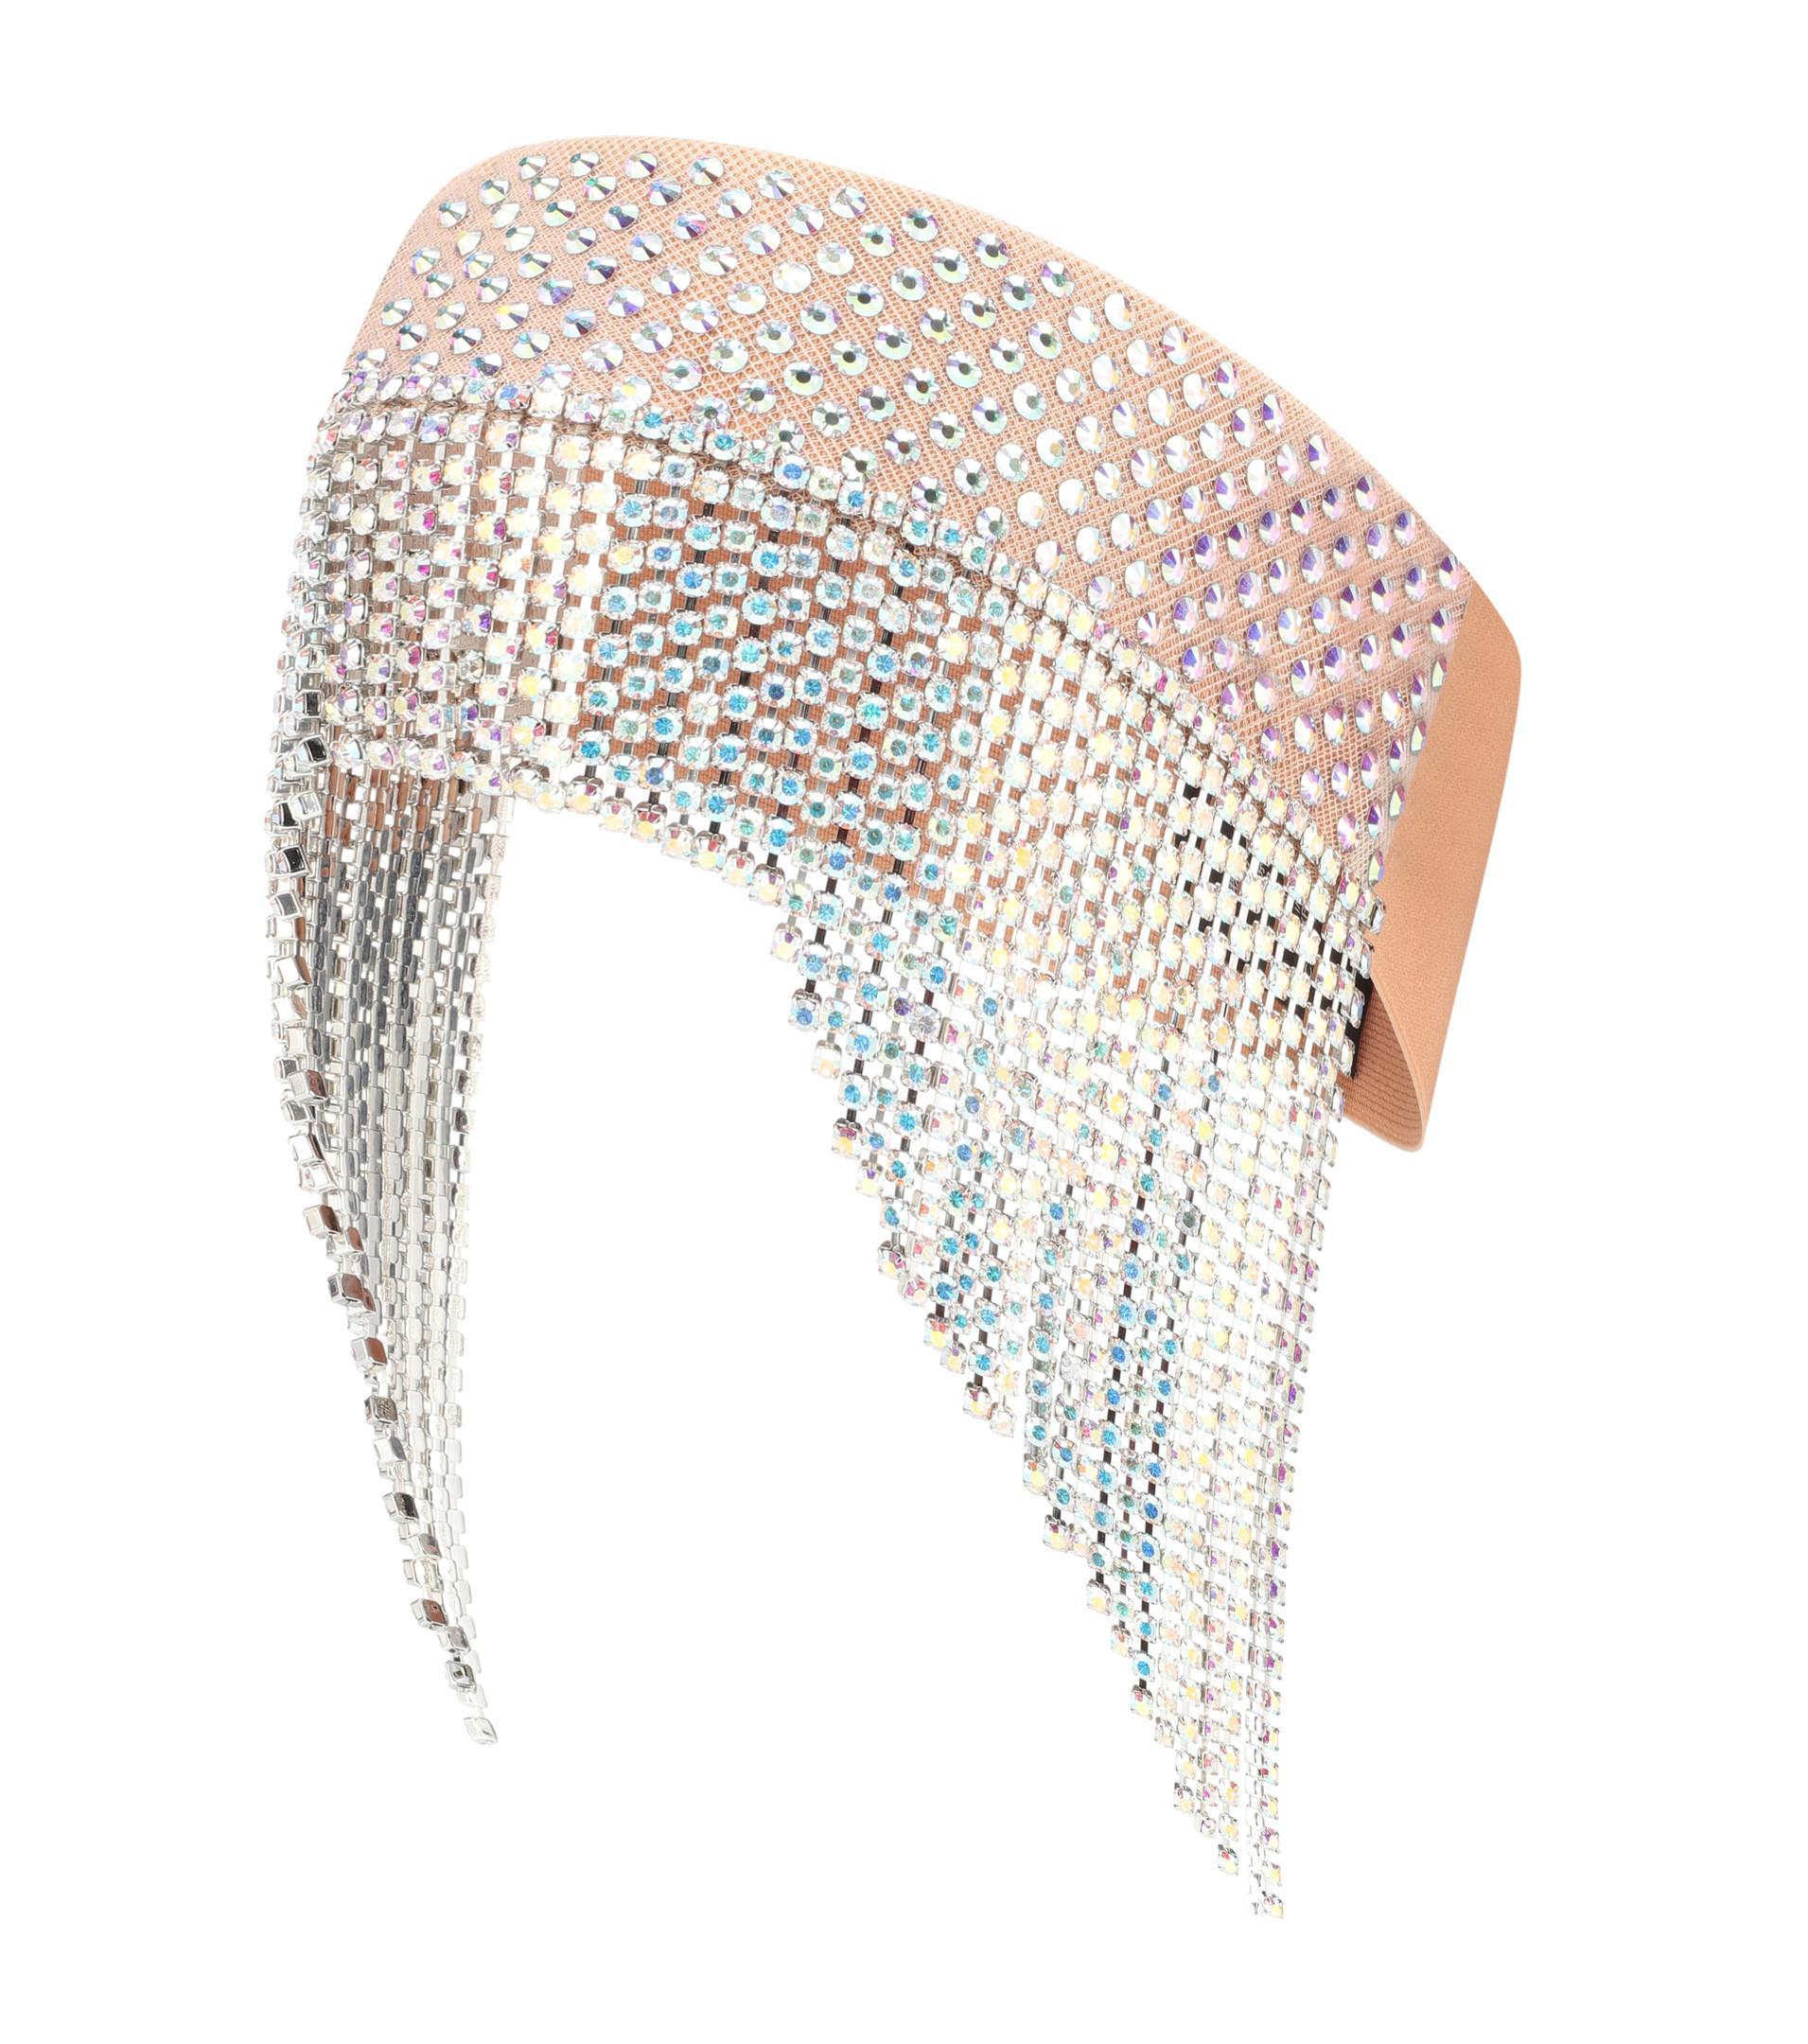 Gucci Swarovski crystal headband vHAEPpxNL